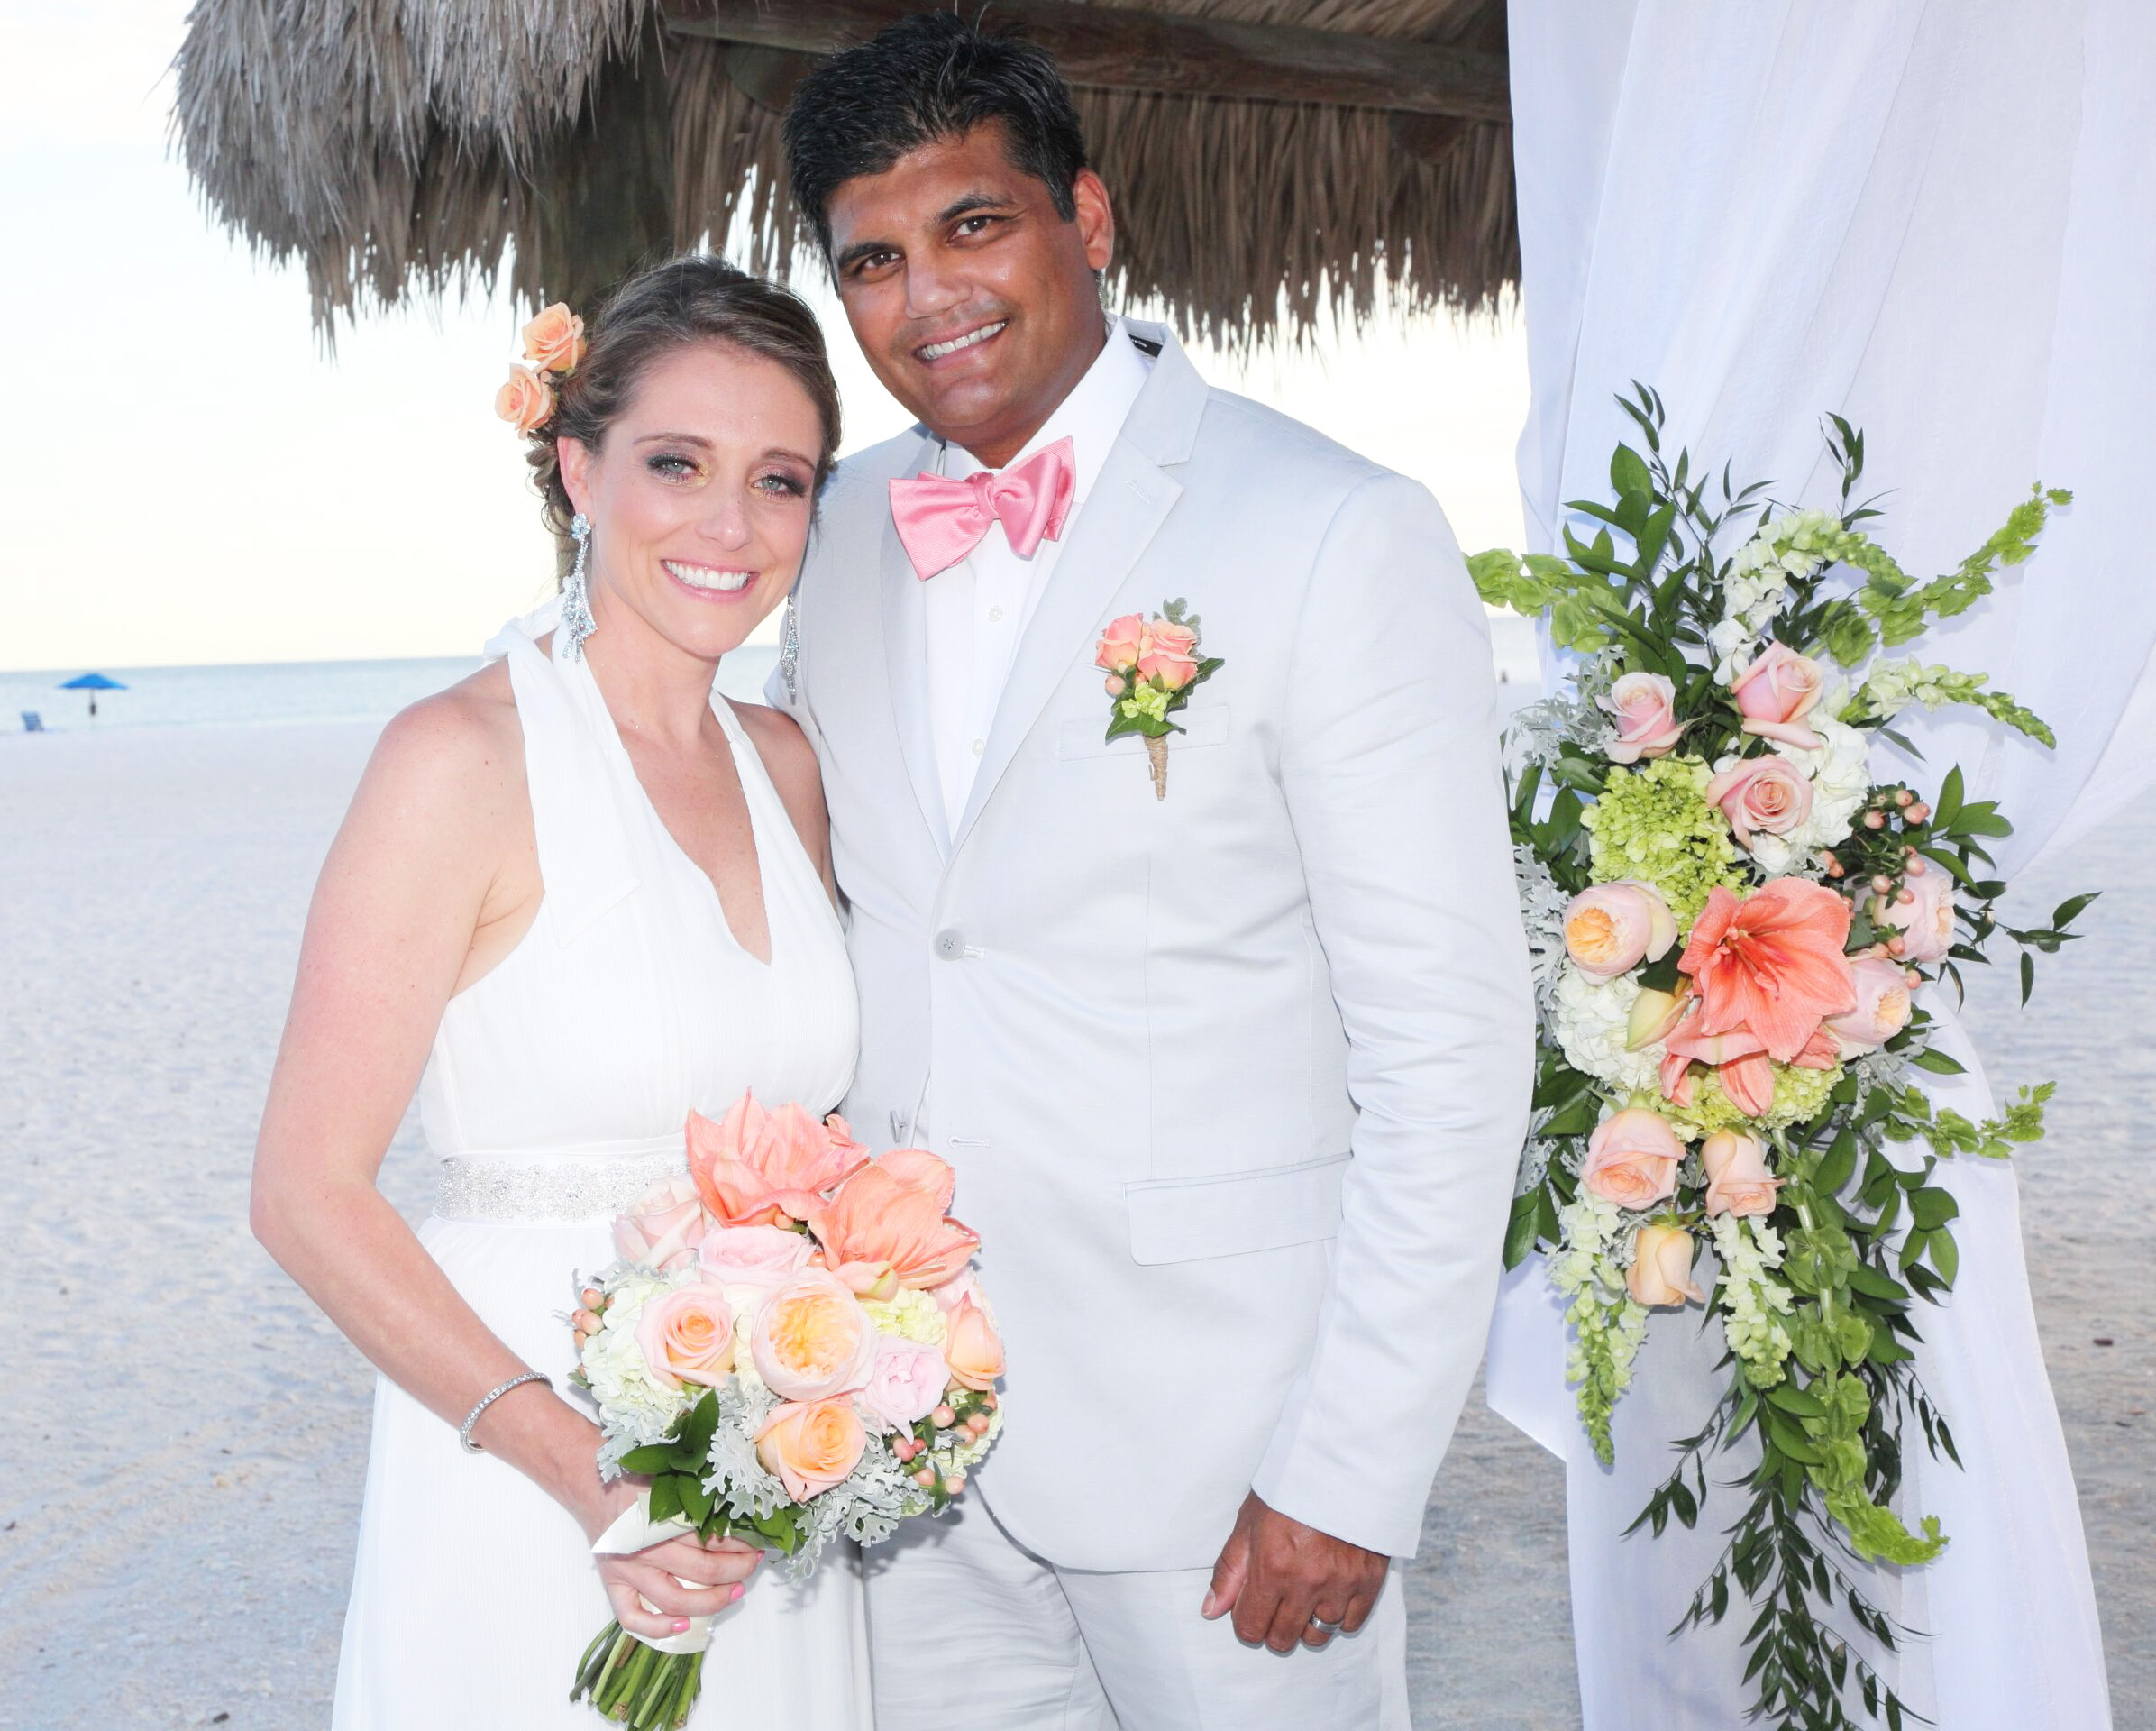 Maria & Nik's Wedding